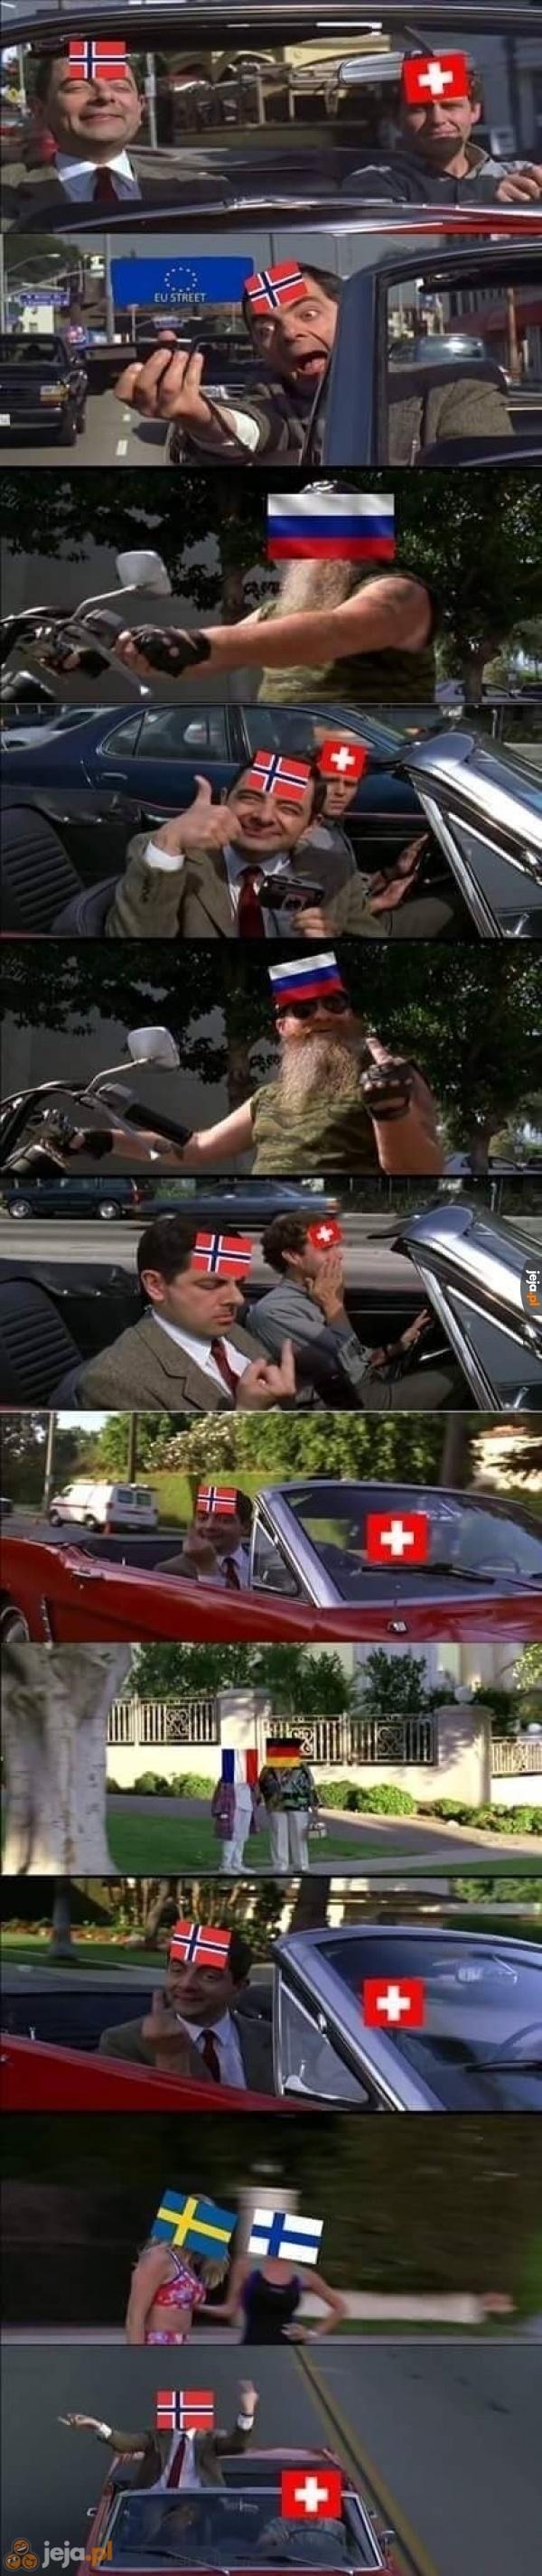 Norwegia i Szwajcaria w Europie